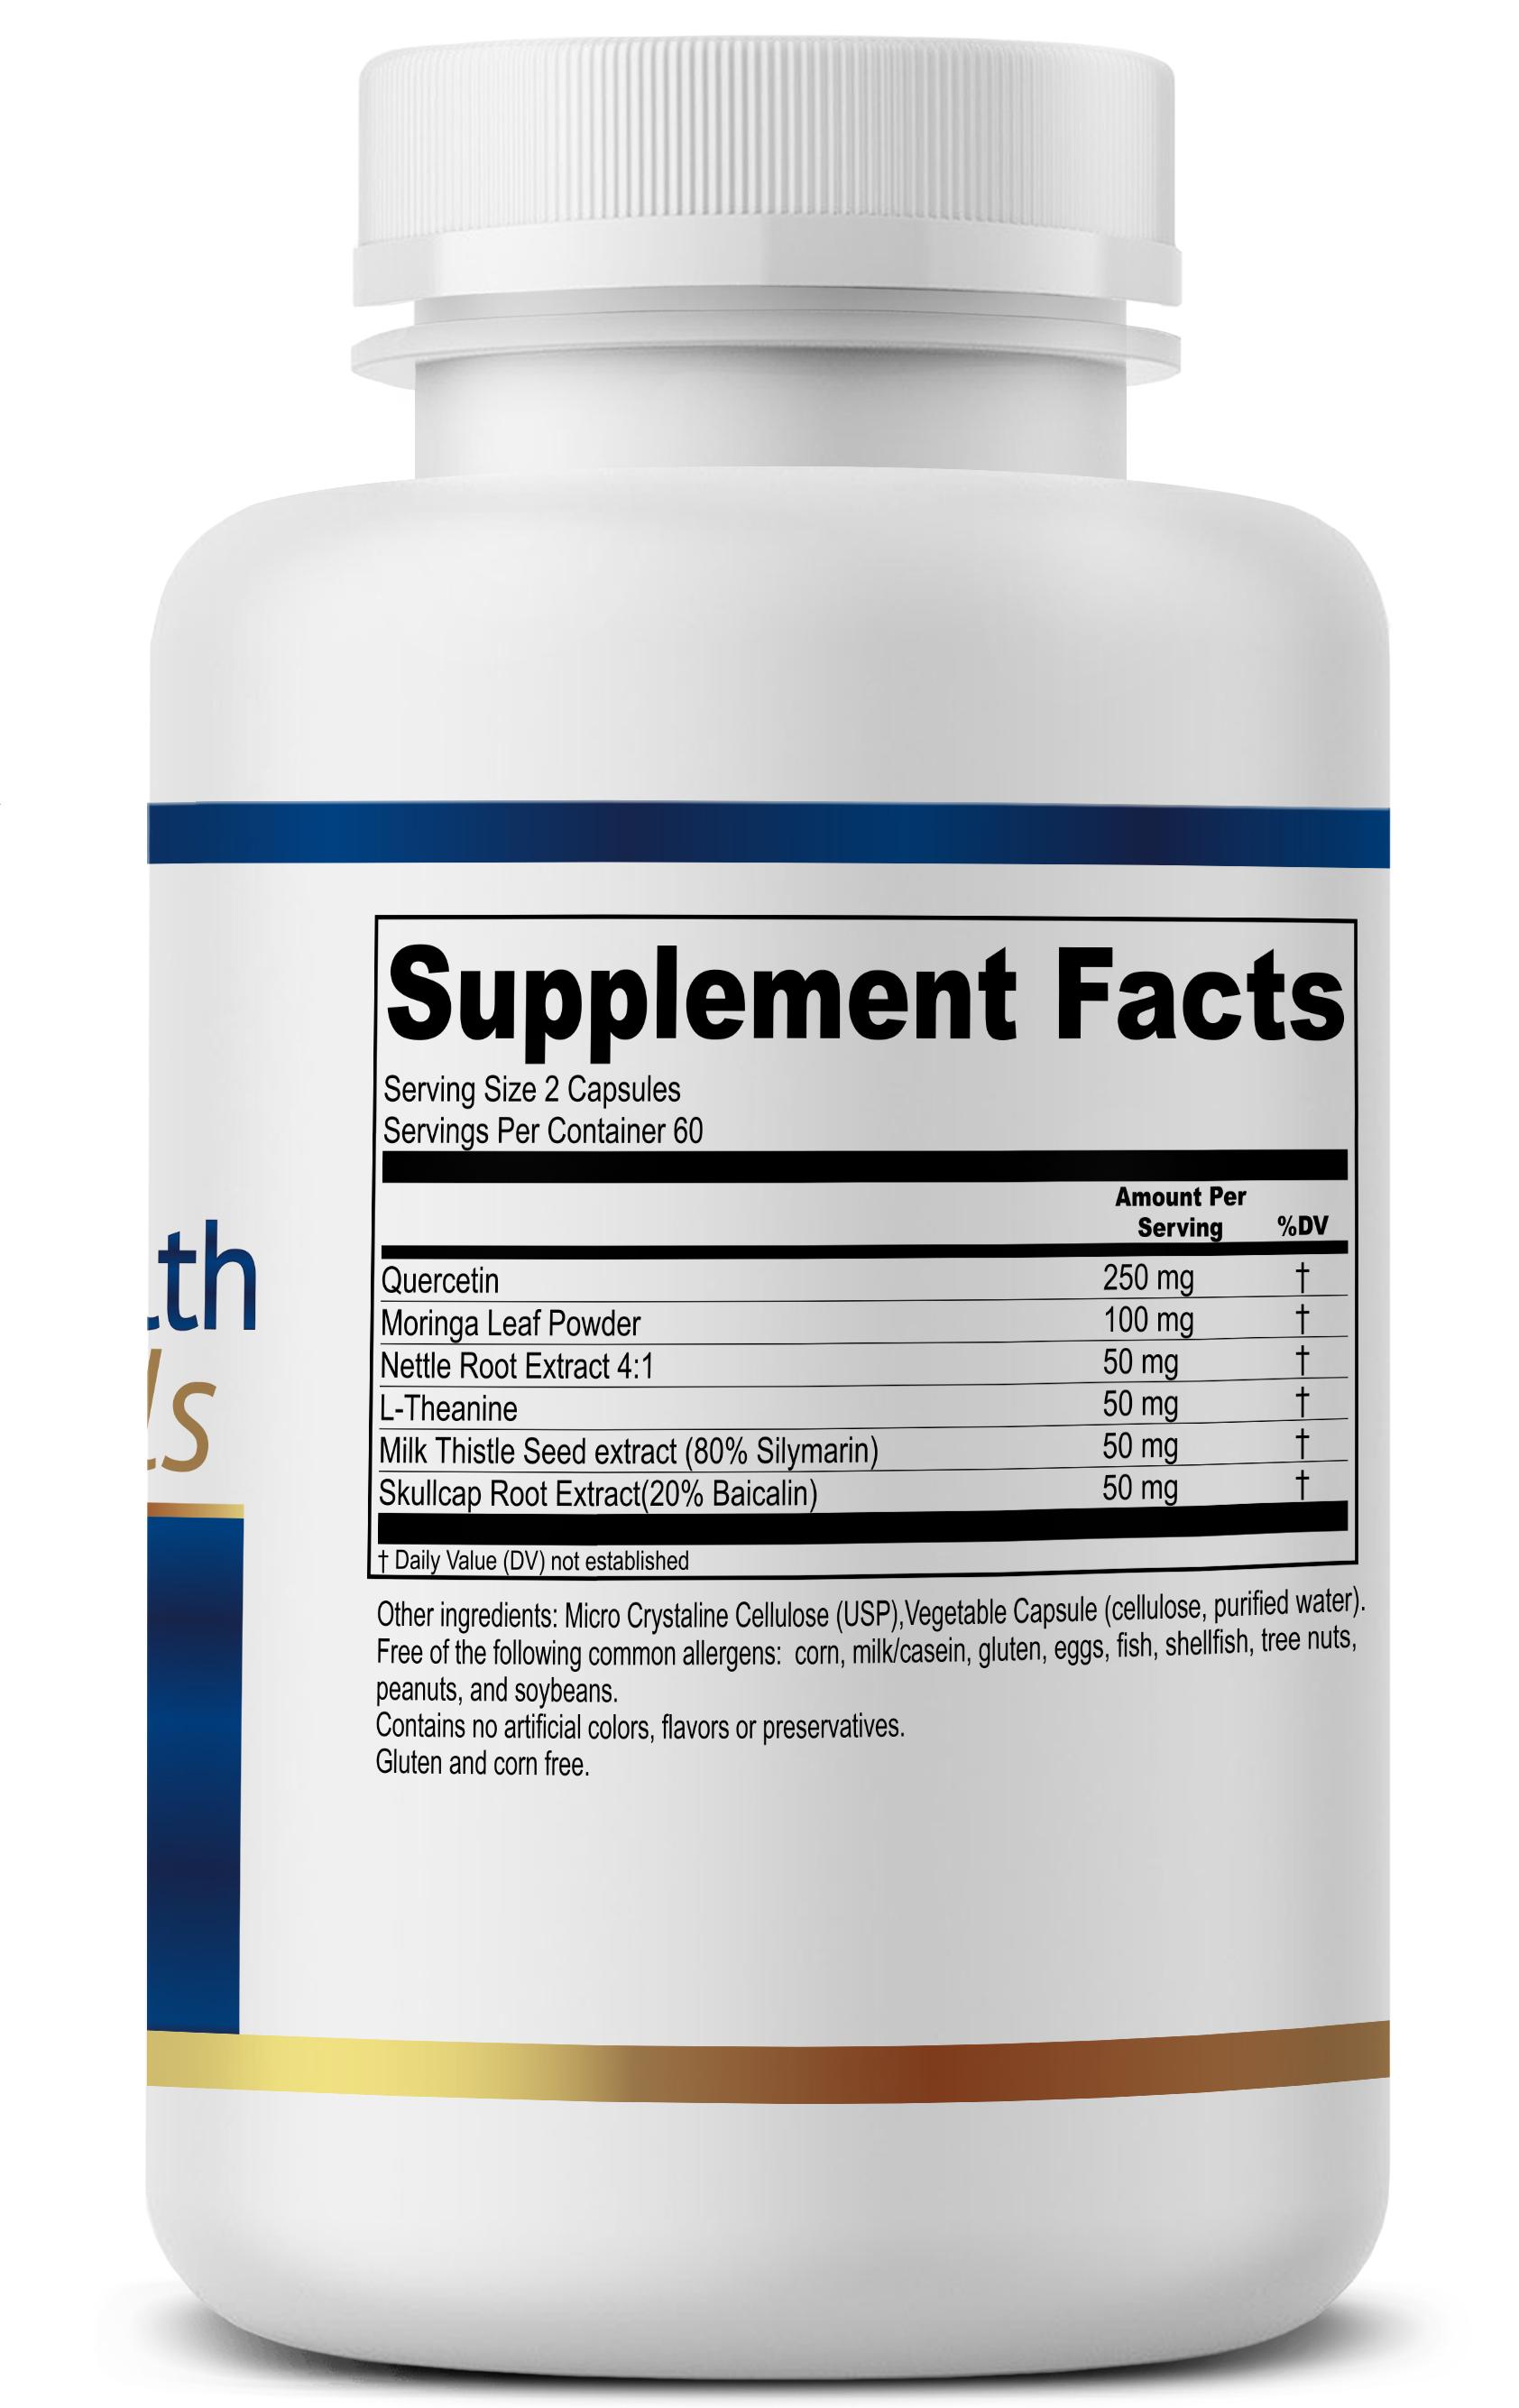 Aller-Mast Supplement Facts